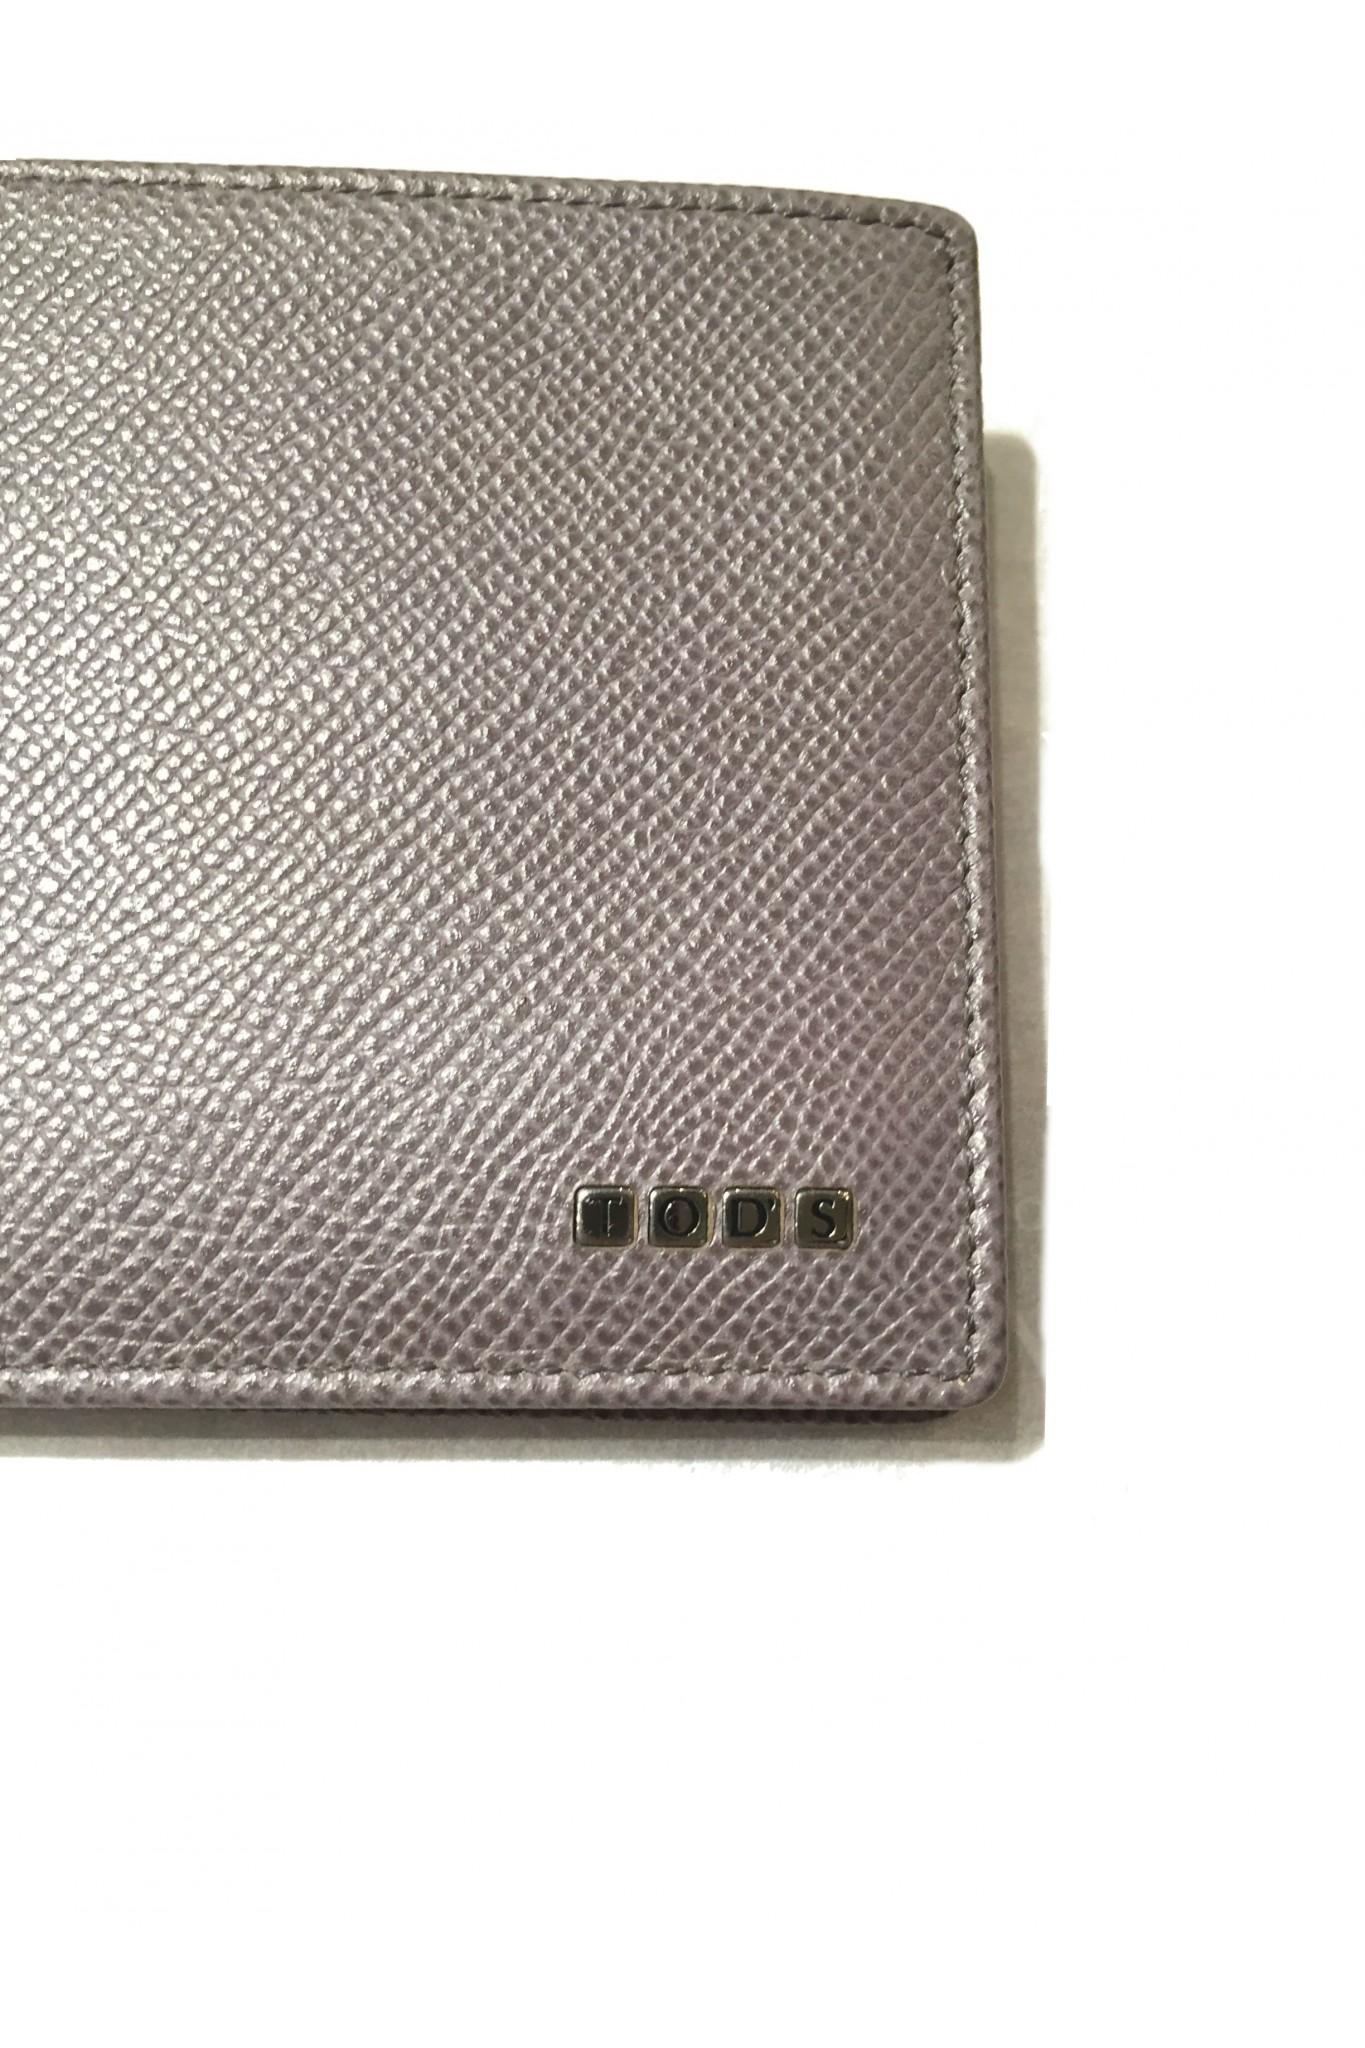 ff98d135ec Vendita portafoglio da uomo Tod's grigio online